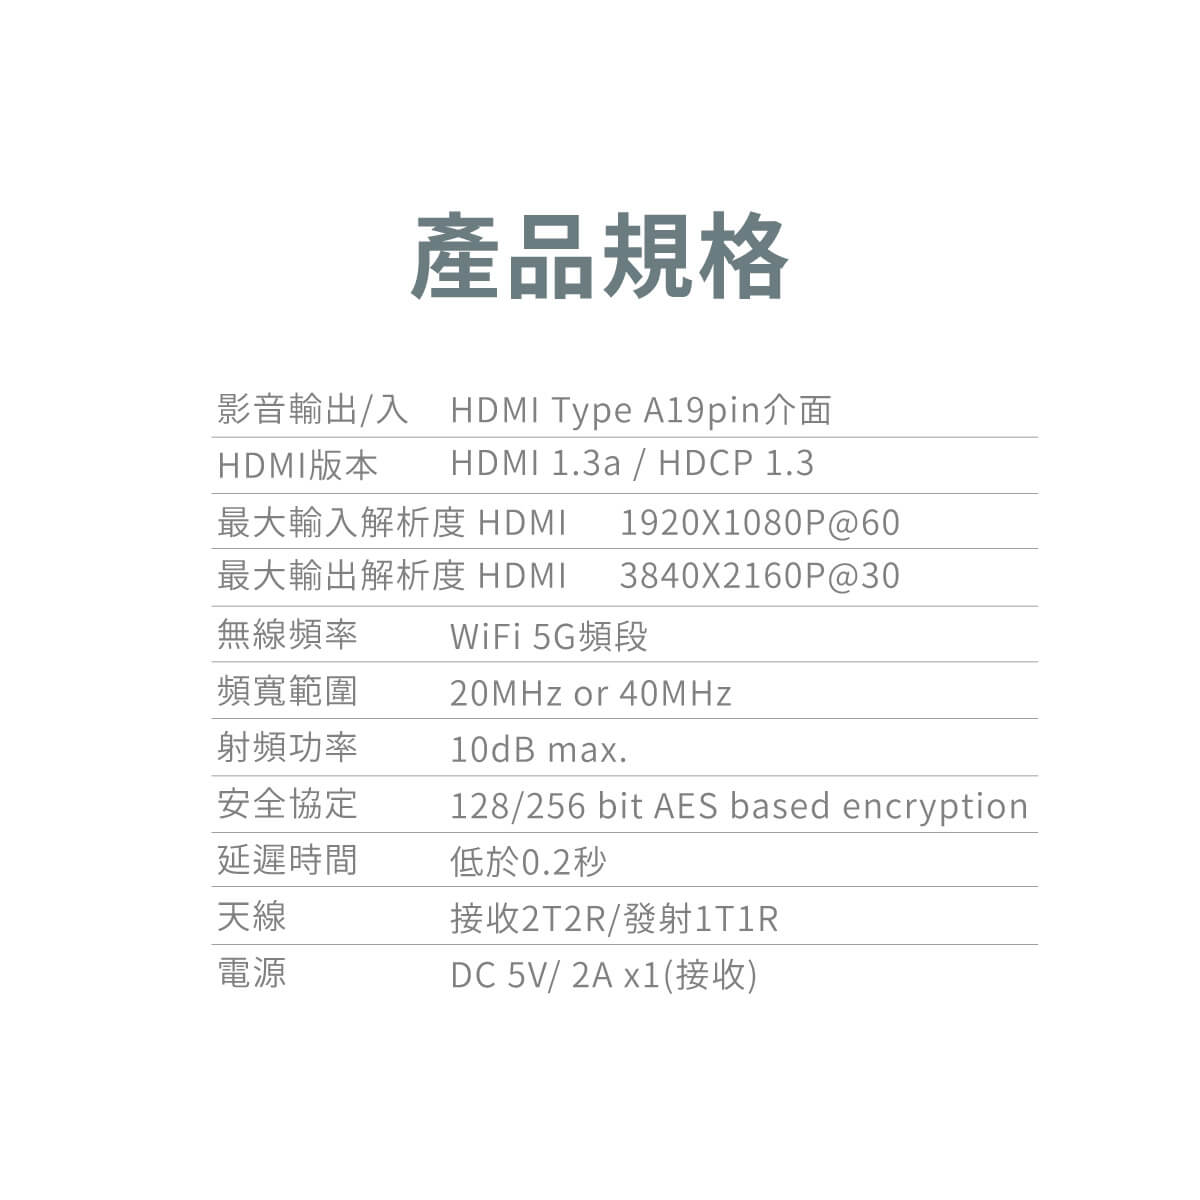 proimages/product/HDMI/WTR-6000/15.jpg